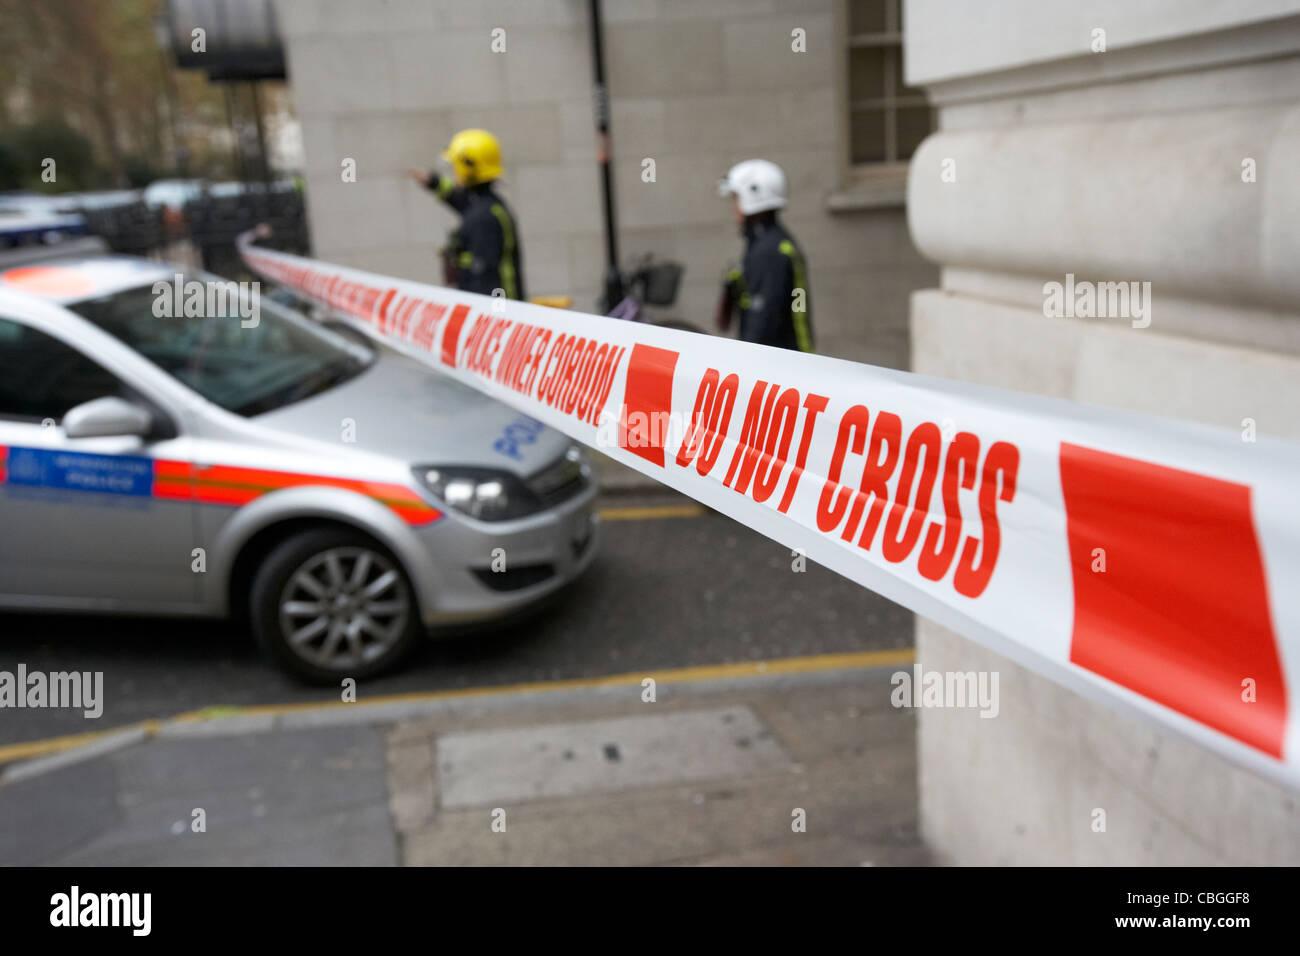 Polizei innere Cordon Band kreuzen nicht am Vorfall im London England uk United kingdom Stockbild